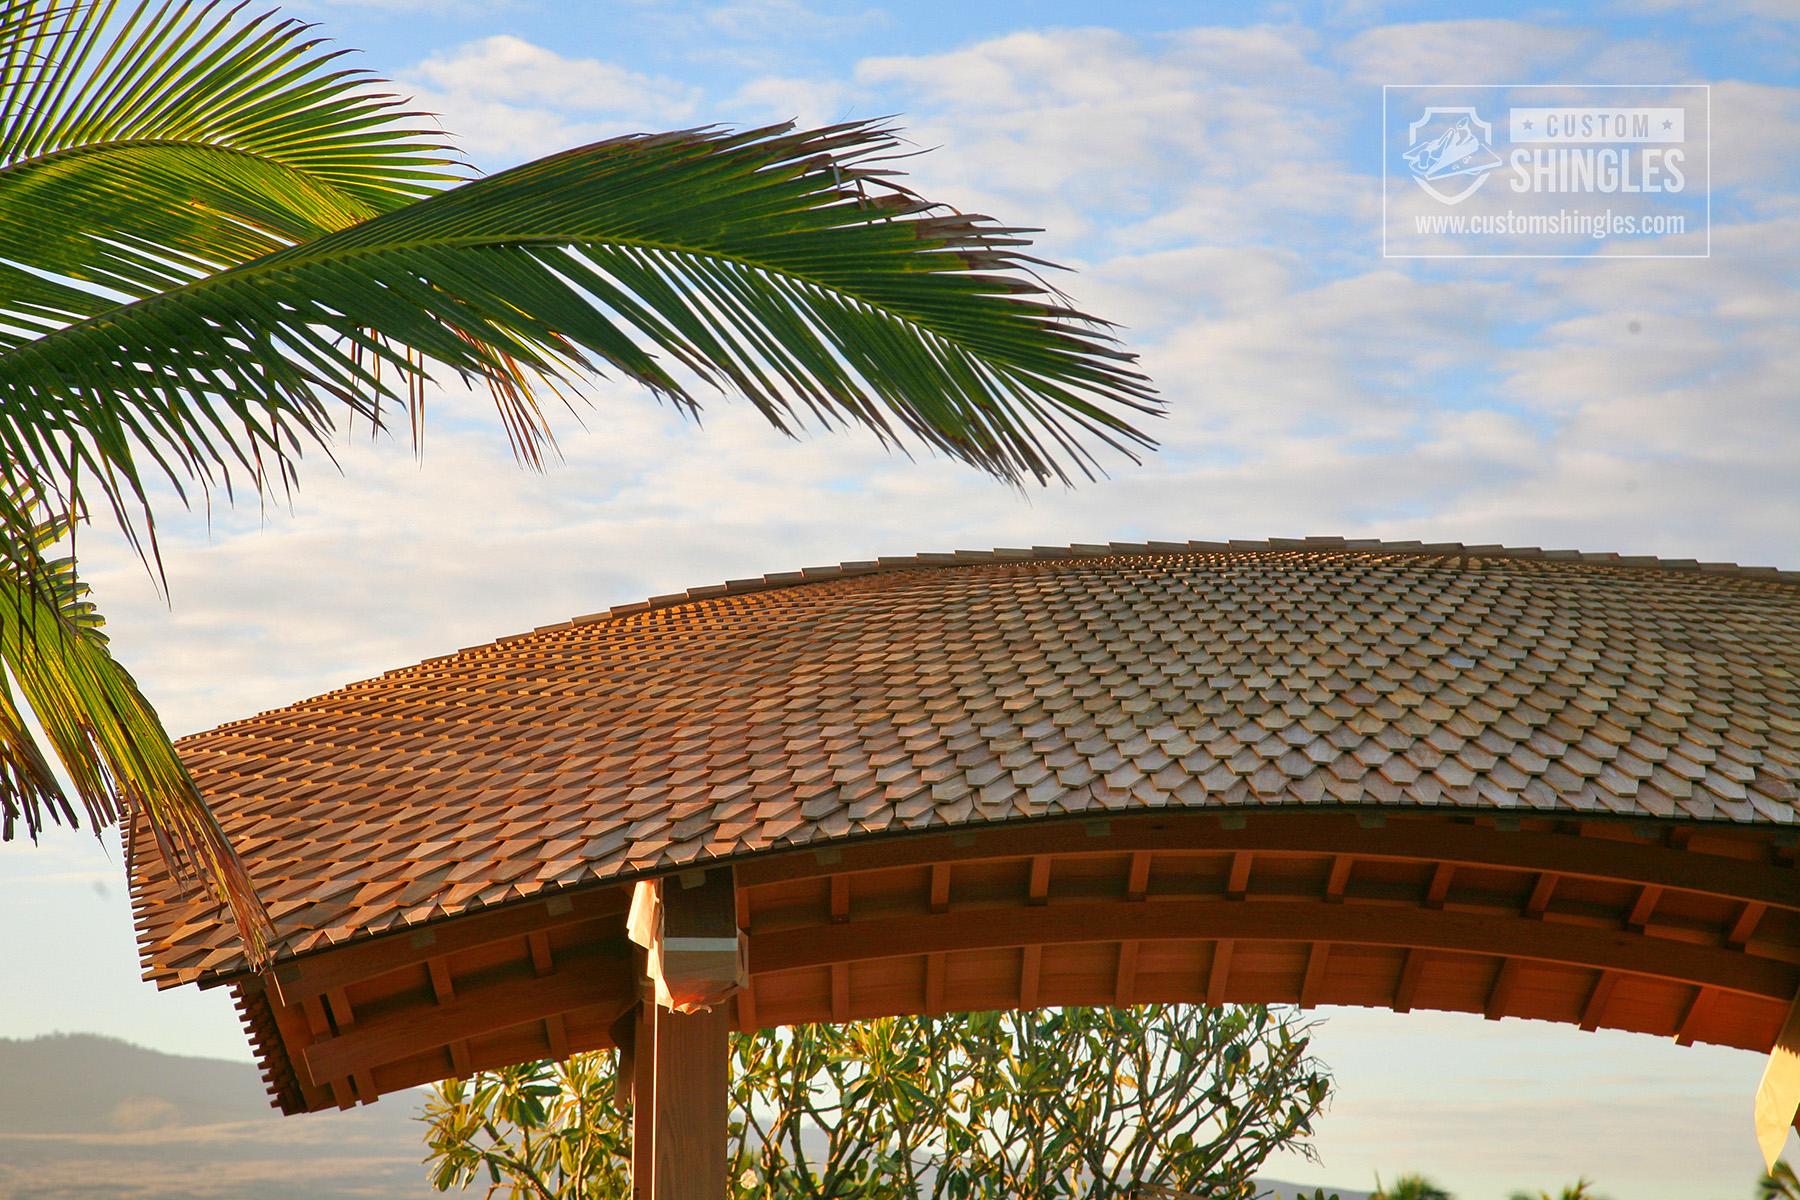 Kona,-Hawaii-Residence-with-Onsite-Steam-Bent-Teak-Shingles-(2) copy.jpg